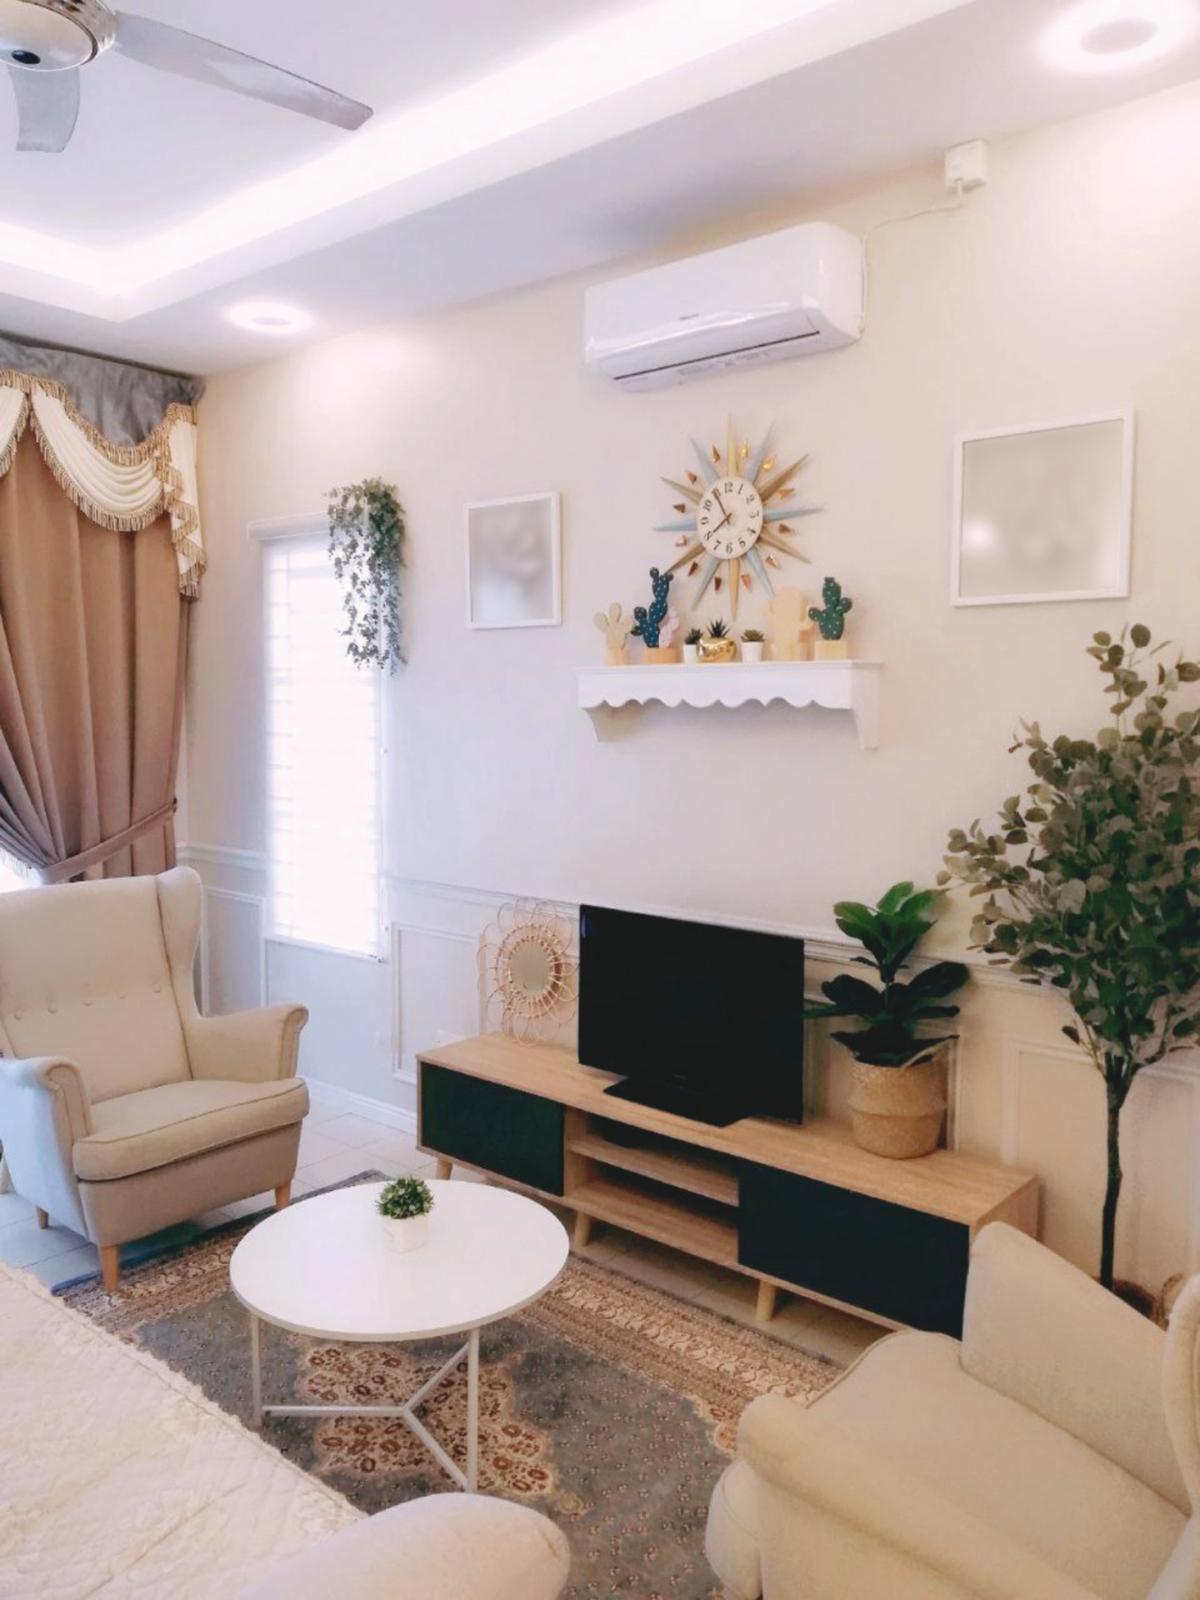 KONSEP moden minimalis dipraktikkan di ruang tamu kediaman.